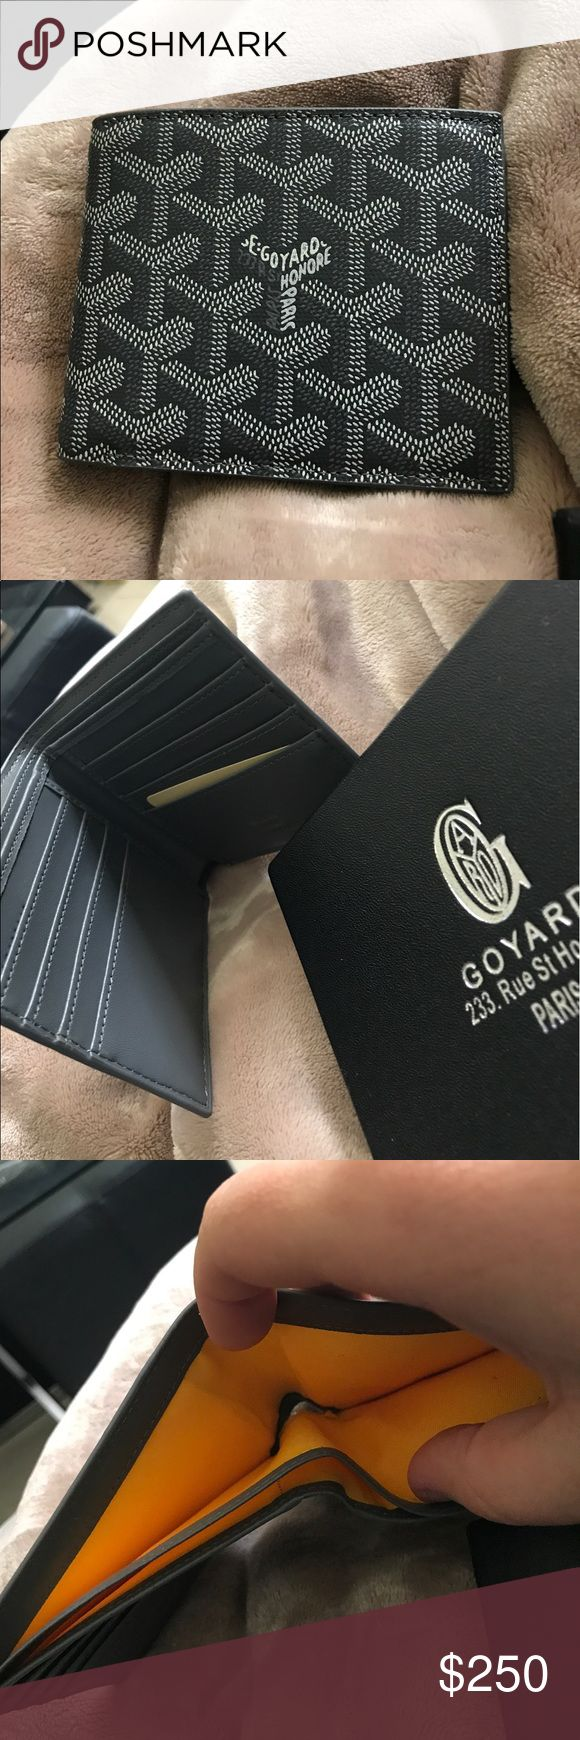 UA GOYARD MENS WALLET IN GREY Replica Goyard wallet in grey. Comes with goyard dust bag, box and tag. Bags Wallets